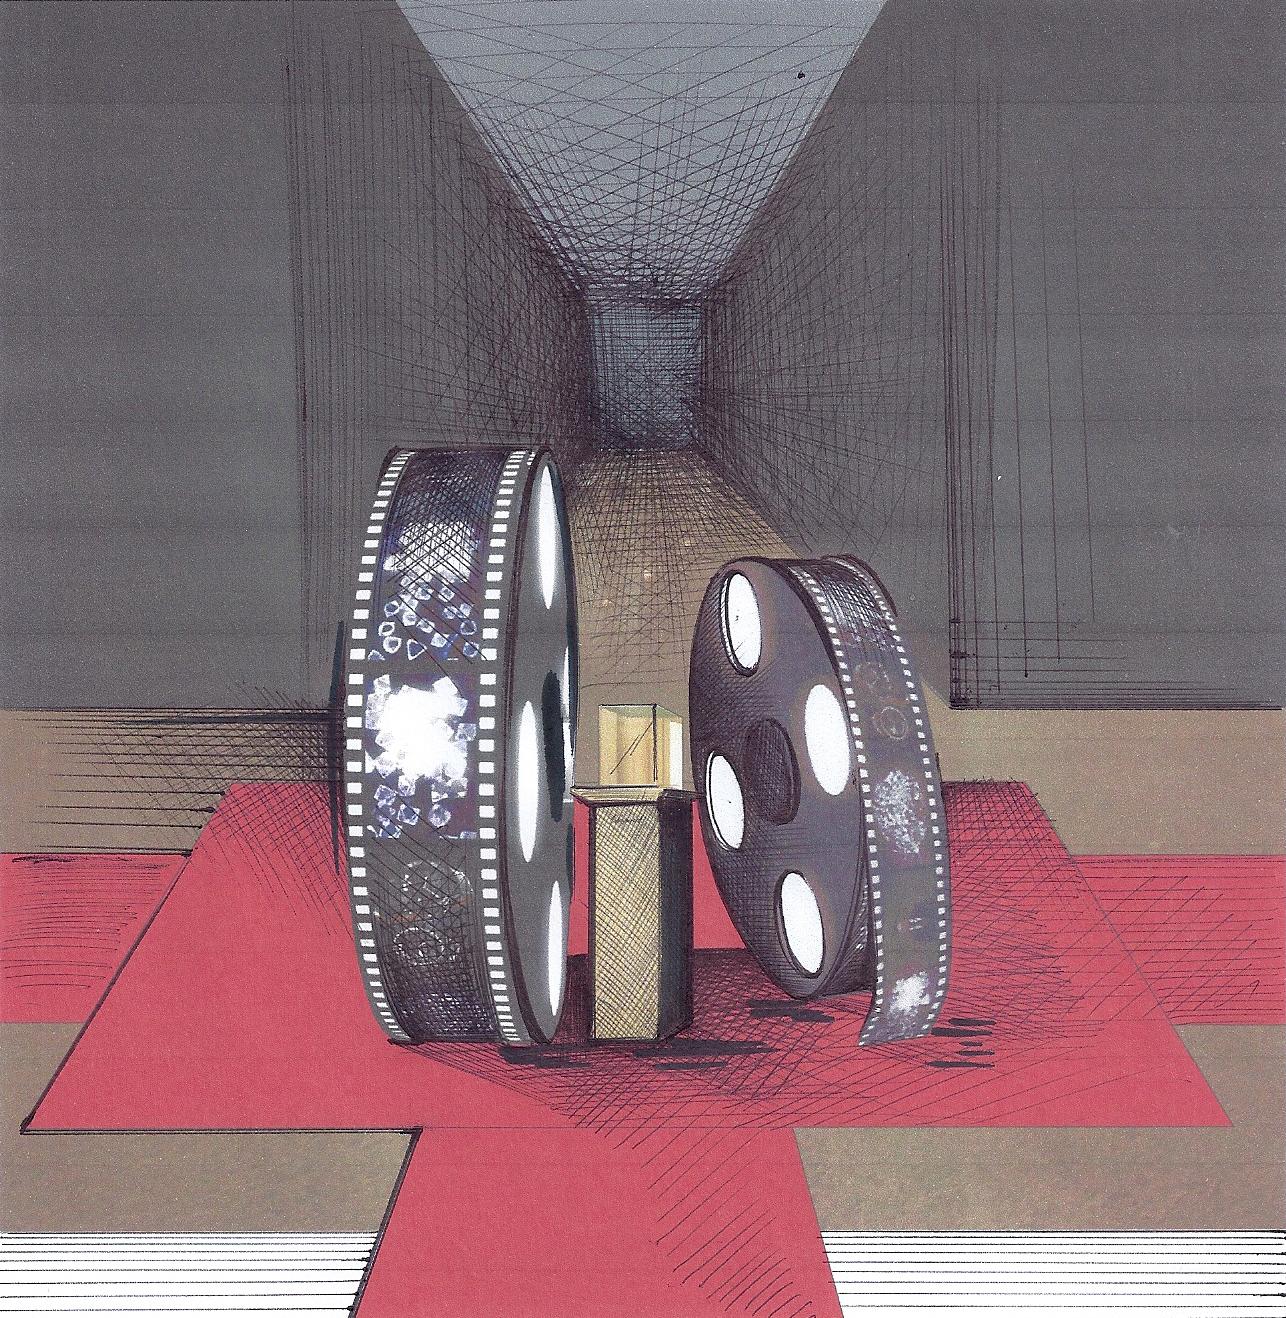 Scan_bobine cinema CHOPARD galleria Bologna copy.jpg